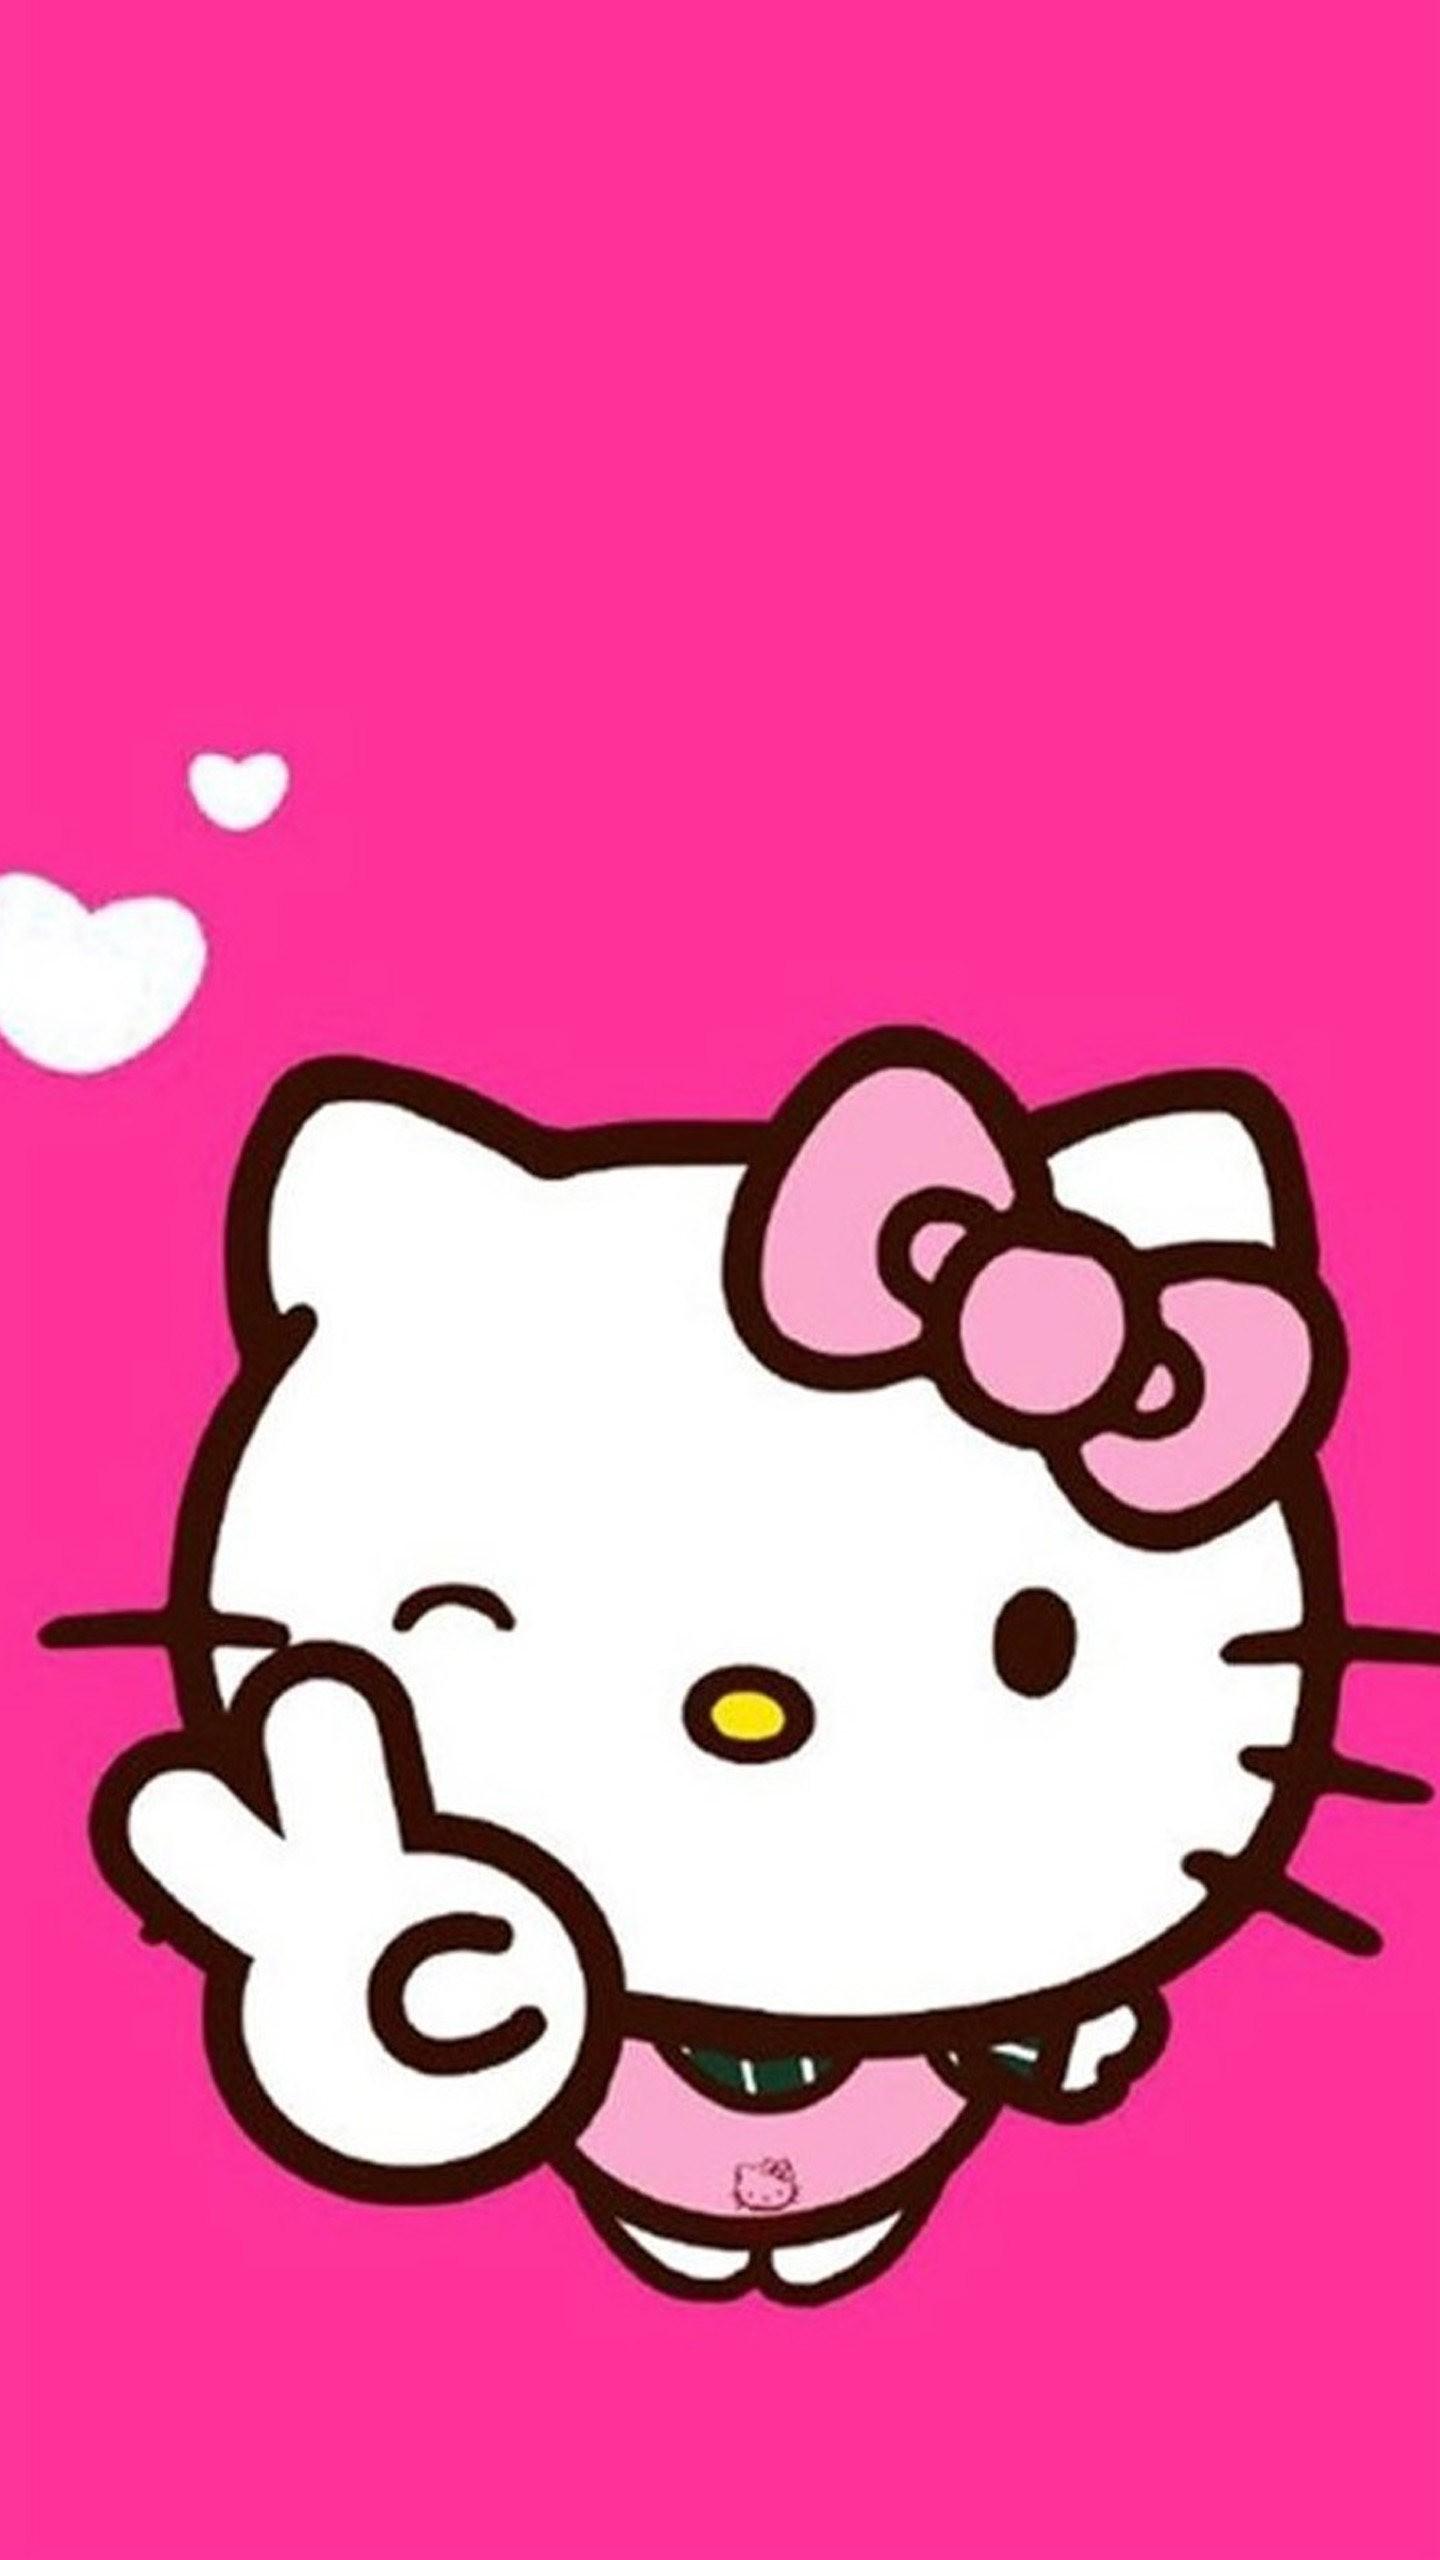 cute-hello-kitty-wallpaper-background-1440×2560.jpg (1440×